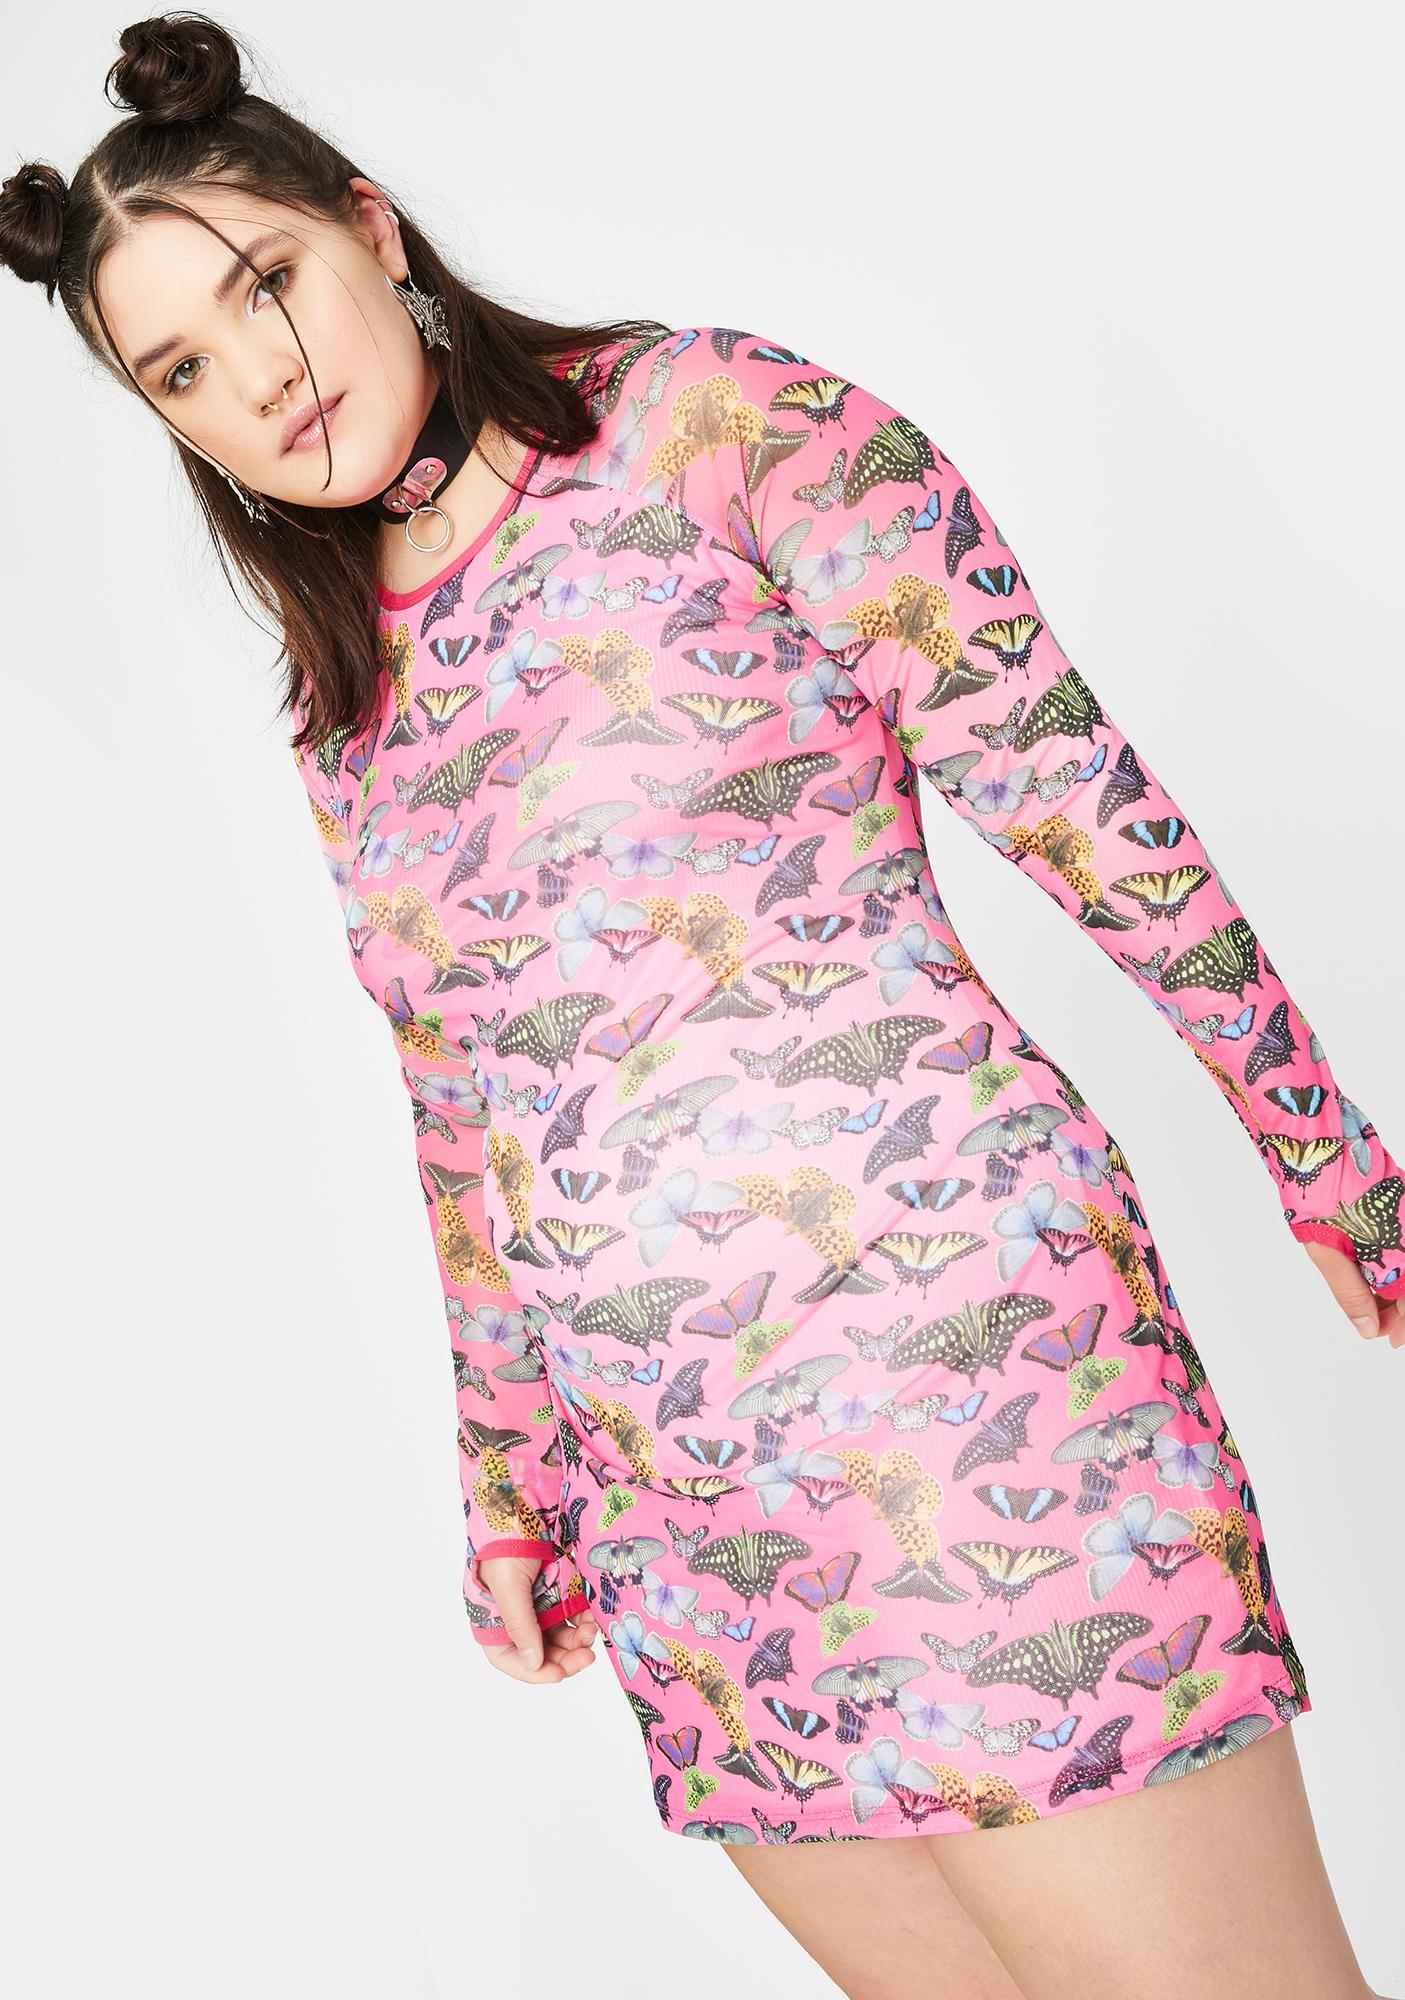 Club Exx True Lovebug Mesh Mini Dress